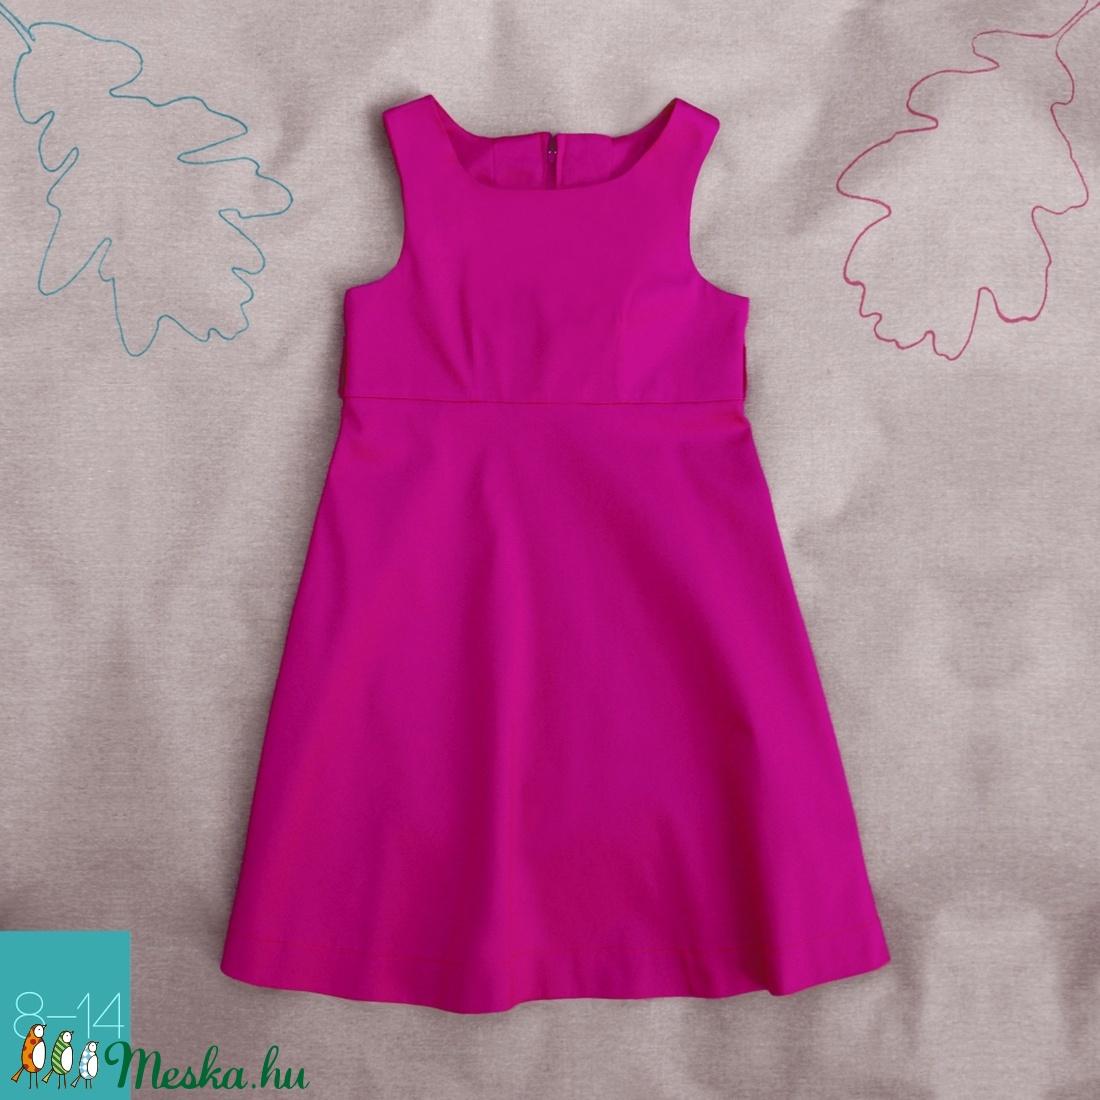 Orgona_lány ruha 146-os (10-11 éves) (814GIRL) - Meska.hu